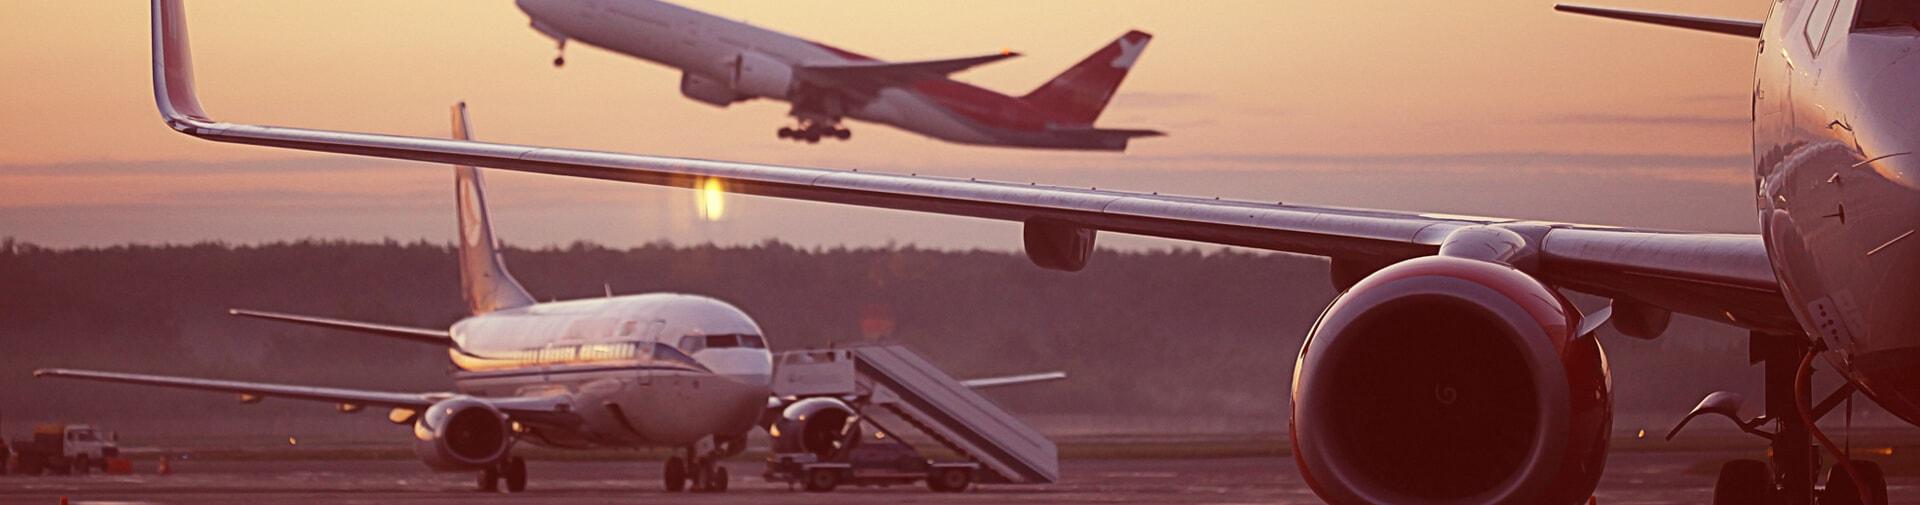 Ibiza Airport (IBZ)